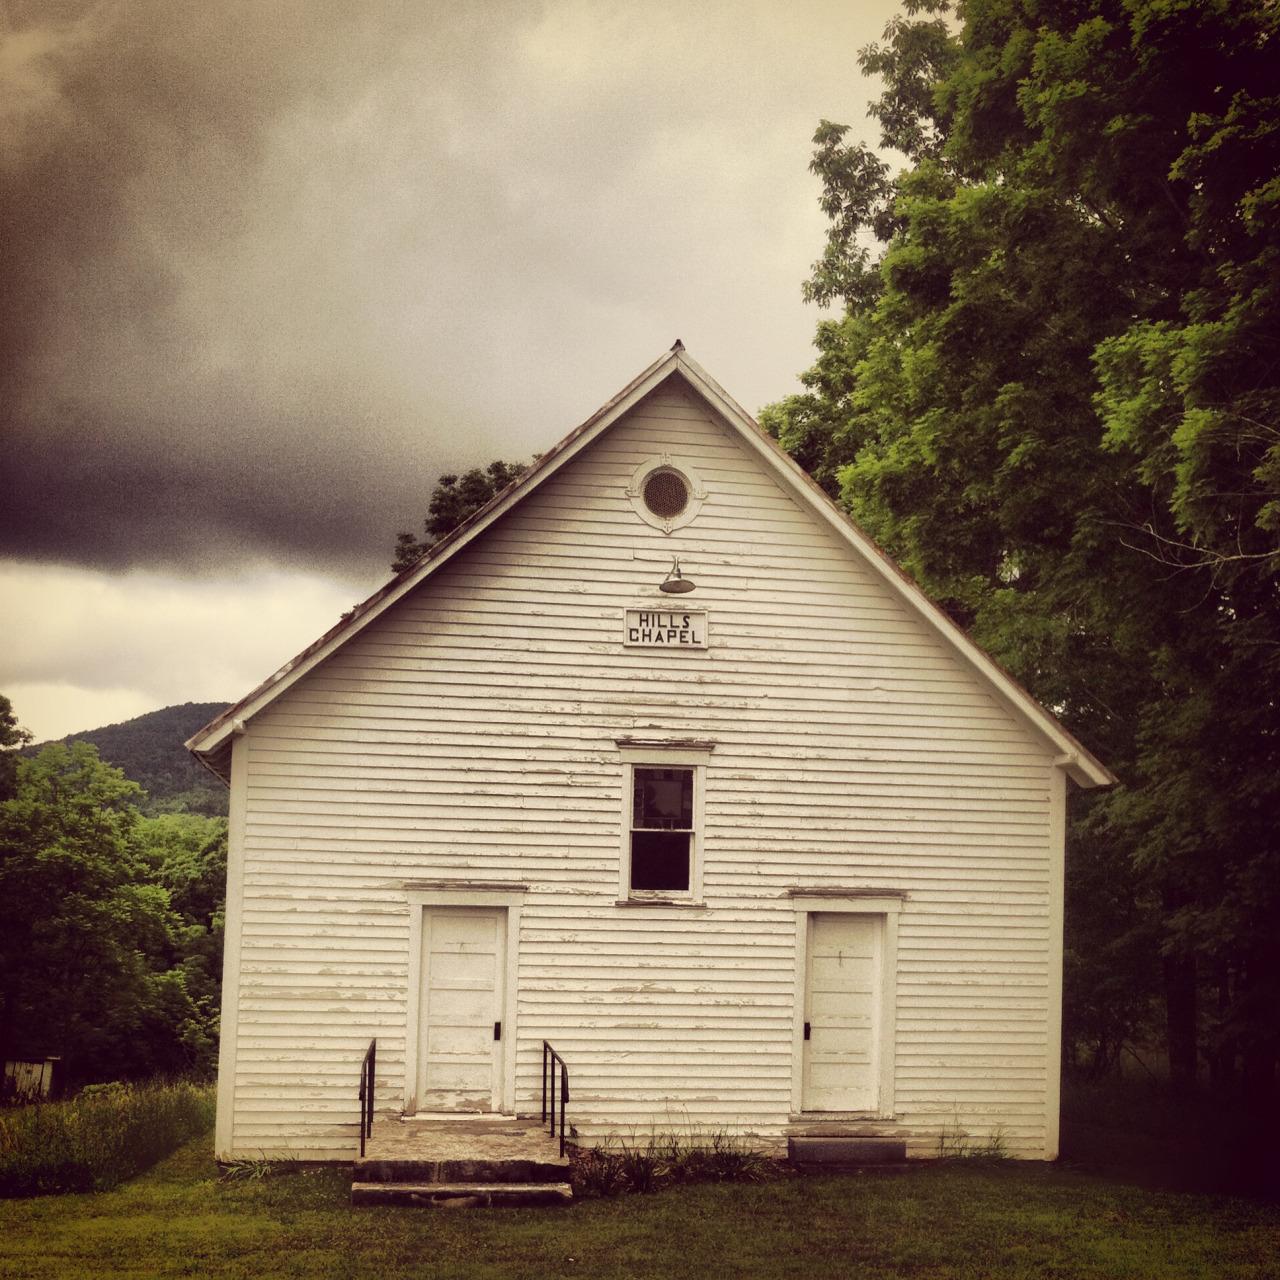 Lobelia, West Virginia (2015)